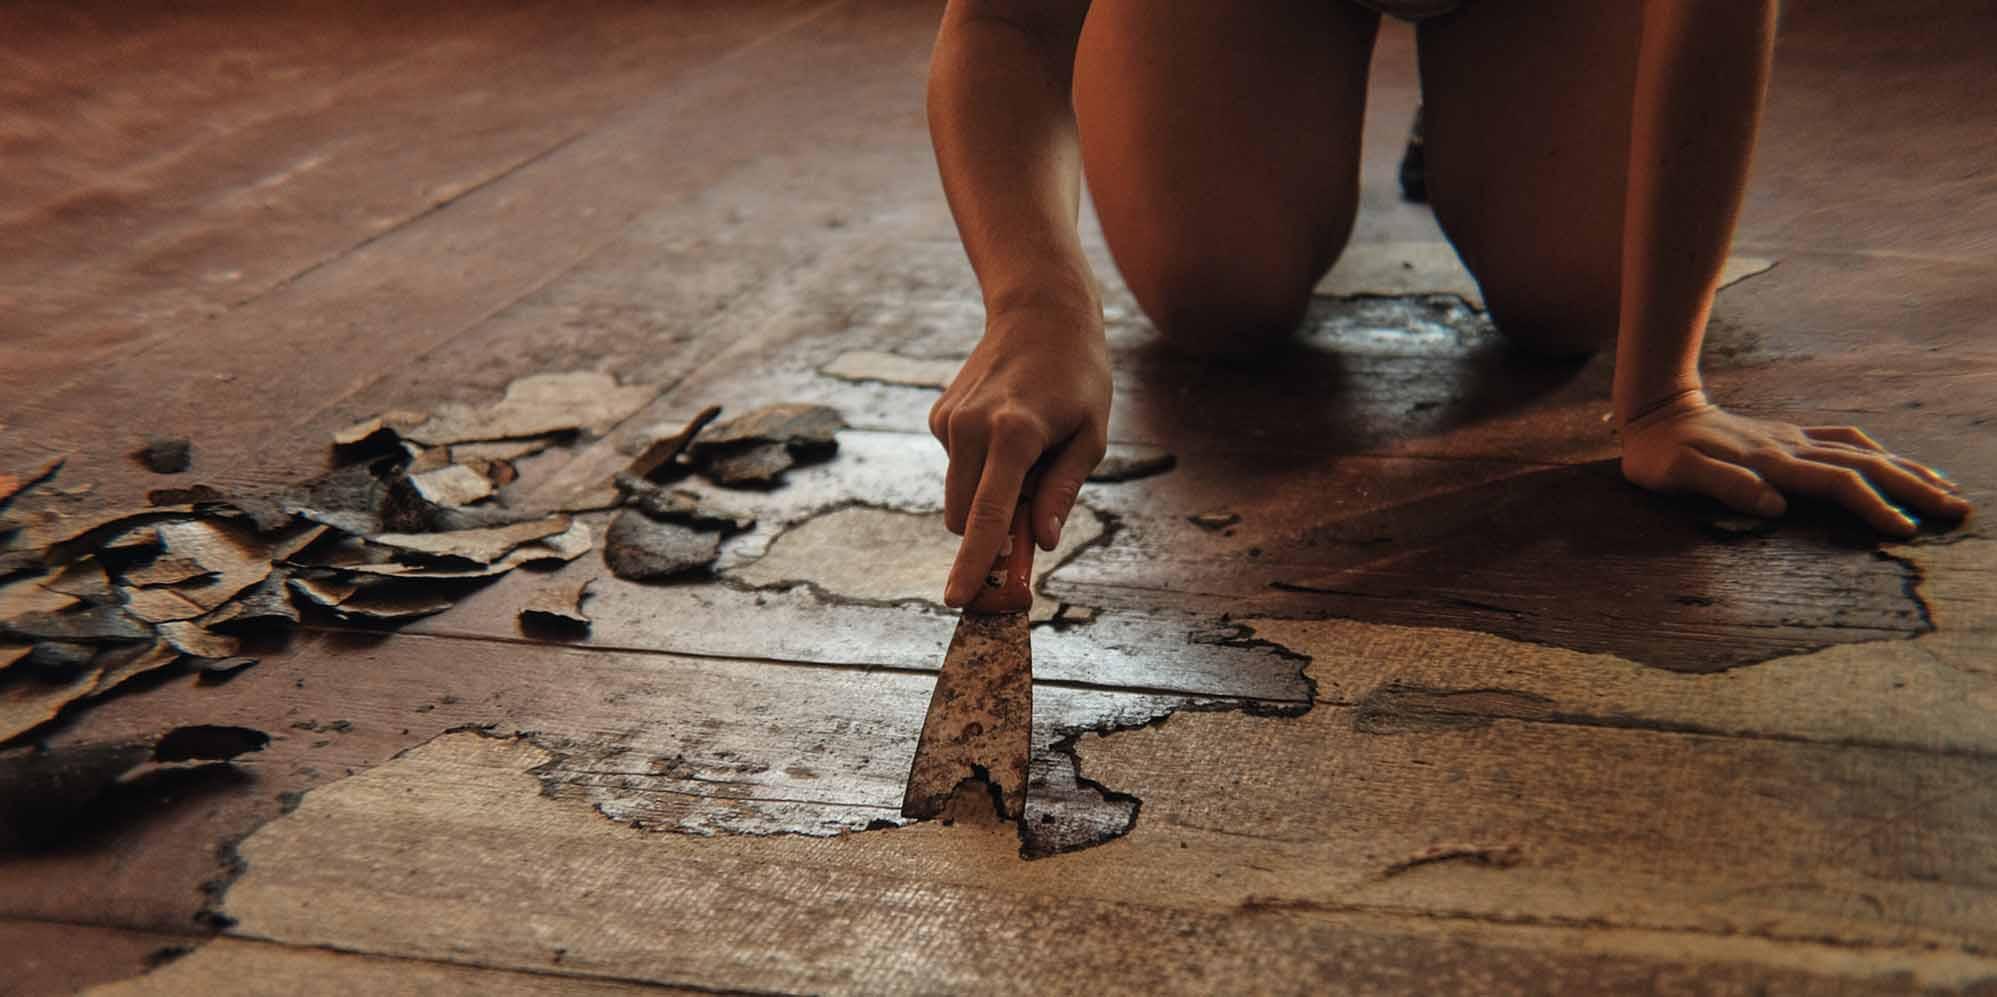 hardwood floor refinishing naperville il of 19 best chicago hardwood floor refinishing companies expertise with regard to hardwood floor refinishing